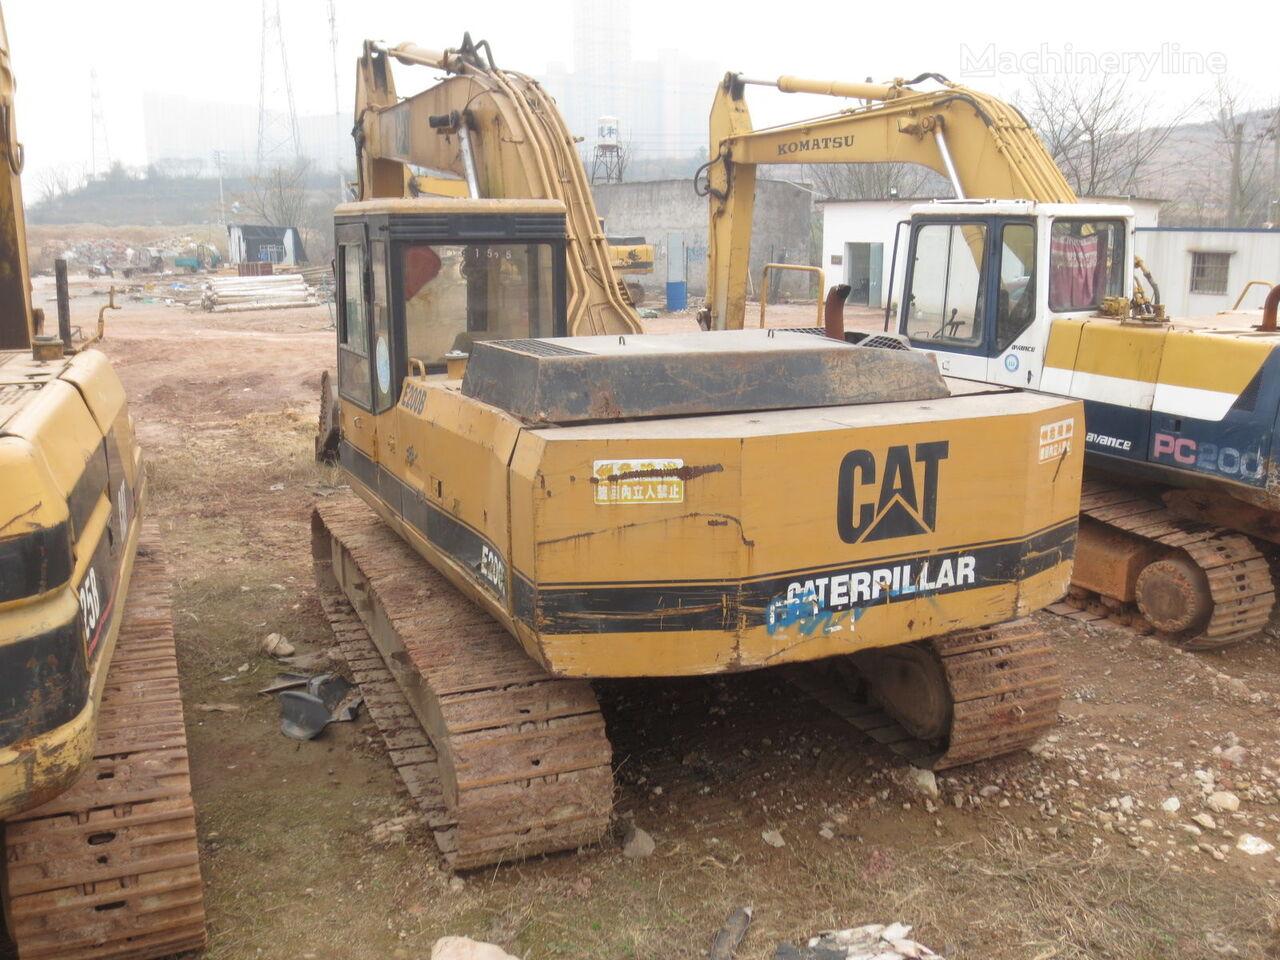 CATERPILLAR E200B EL200B tracked excavator